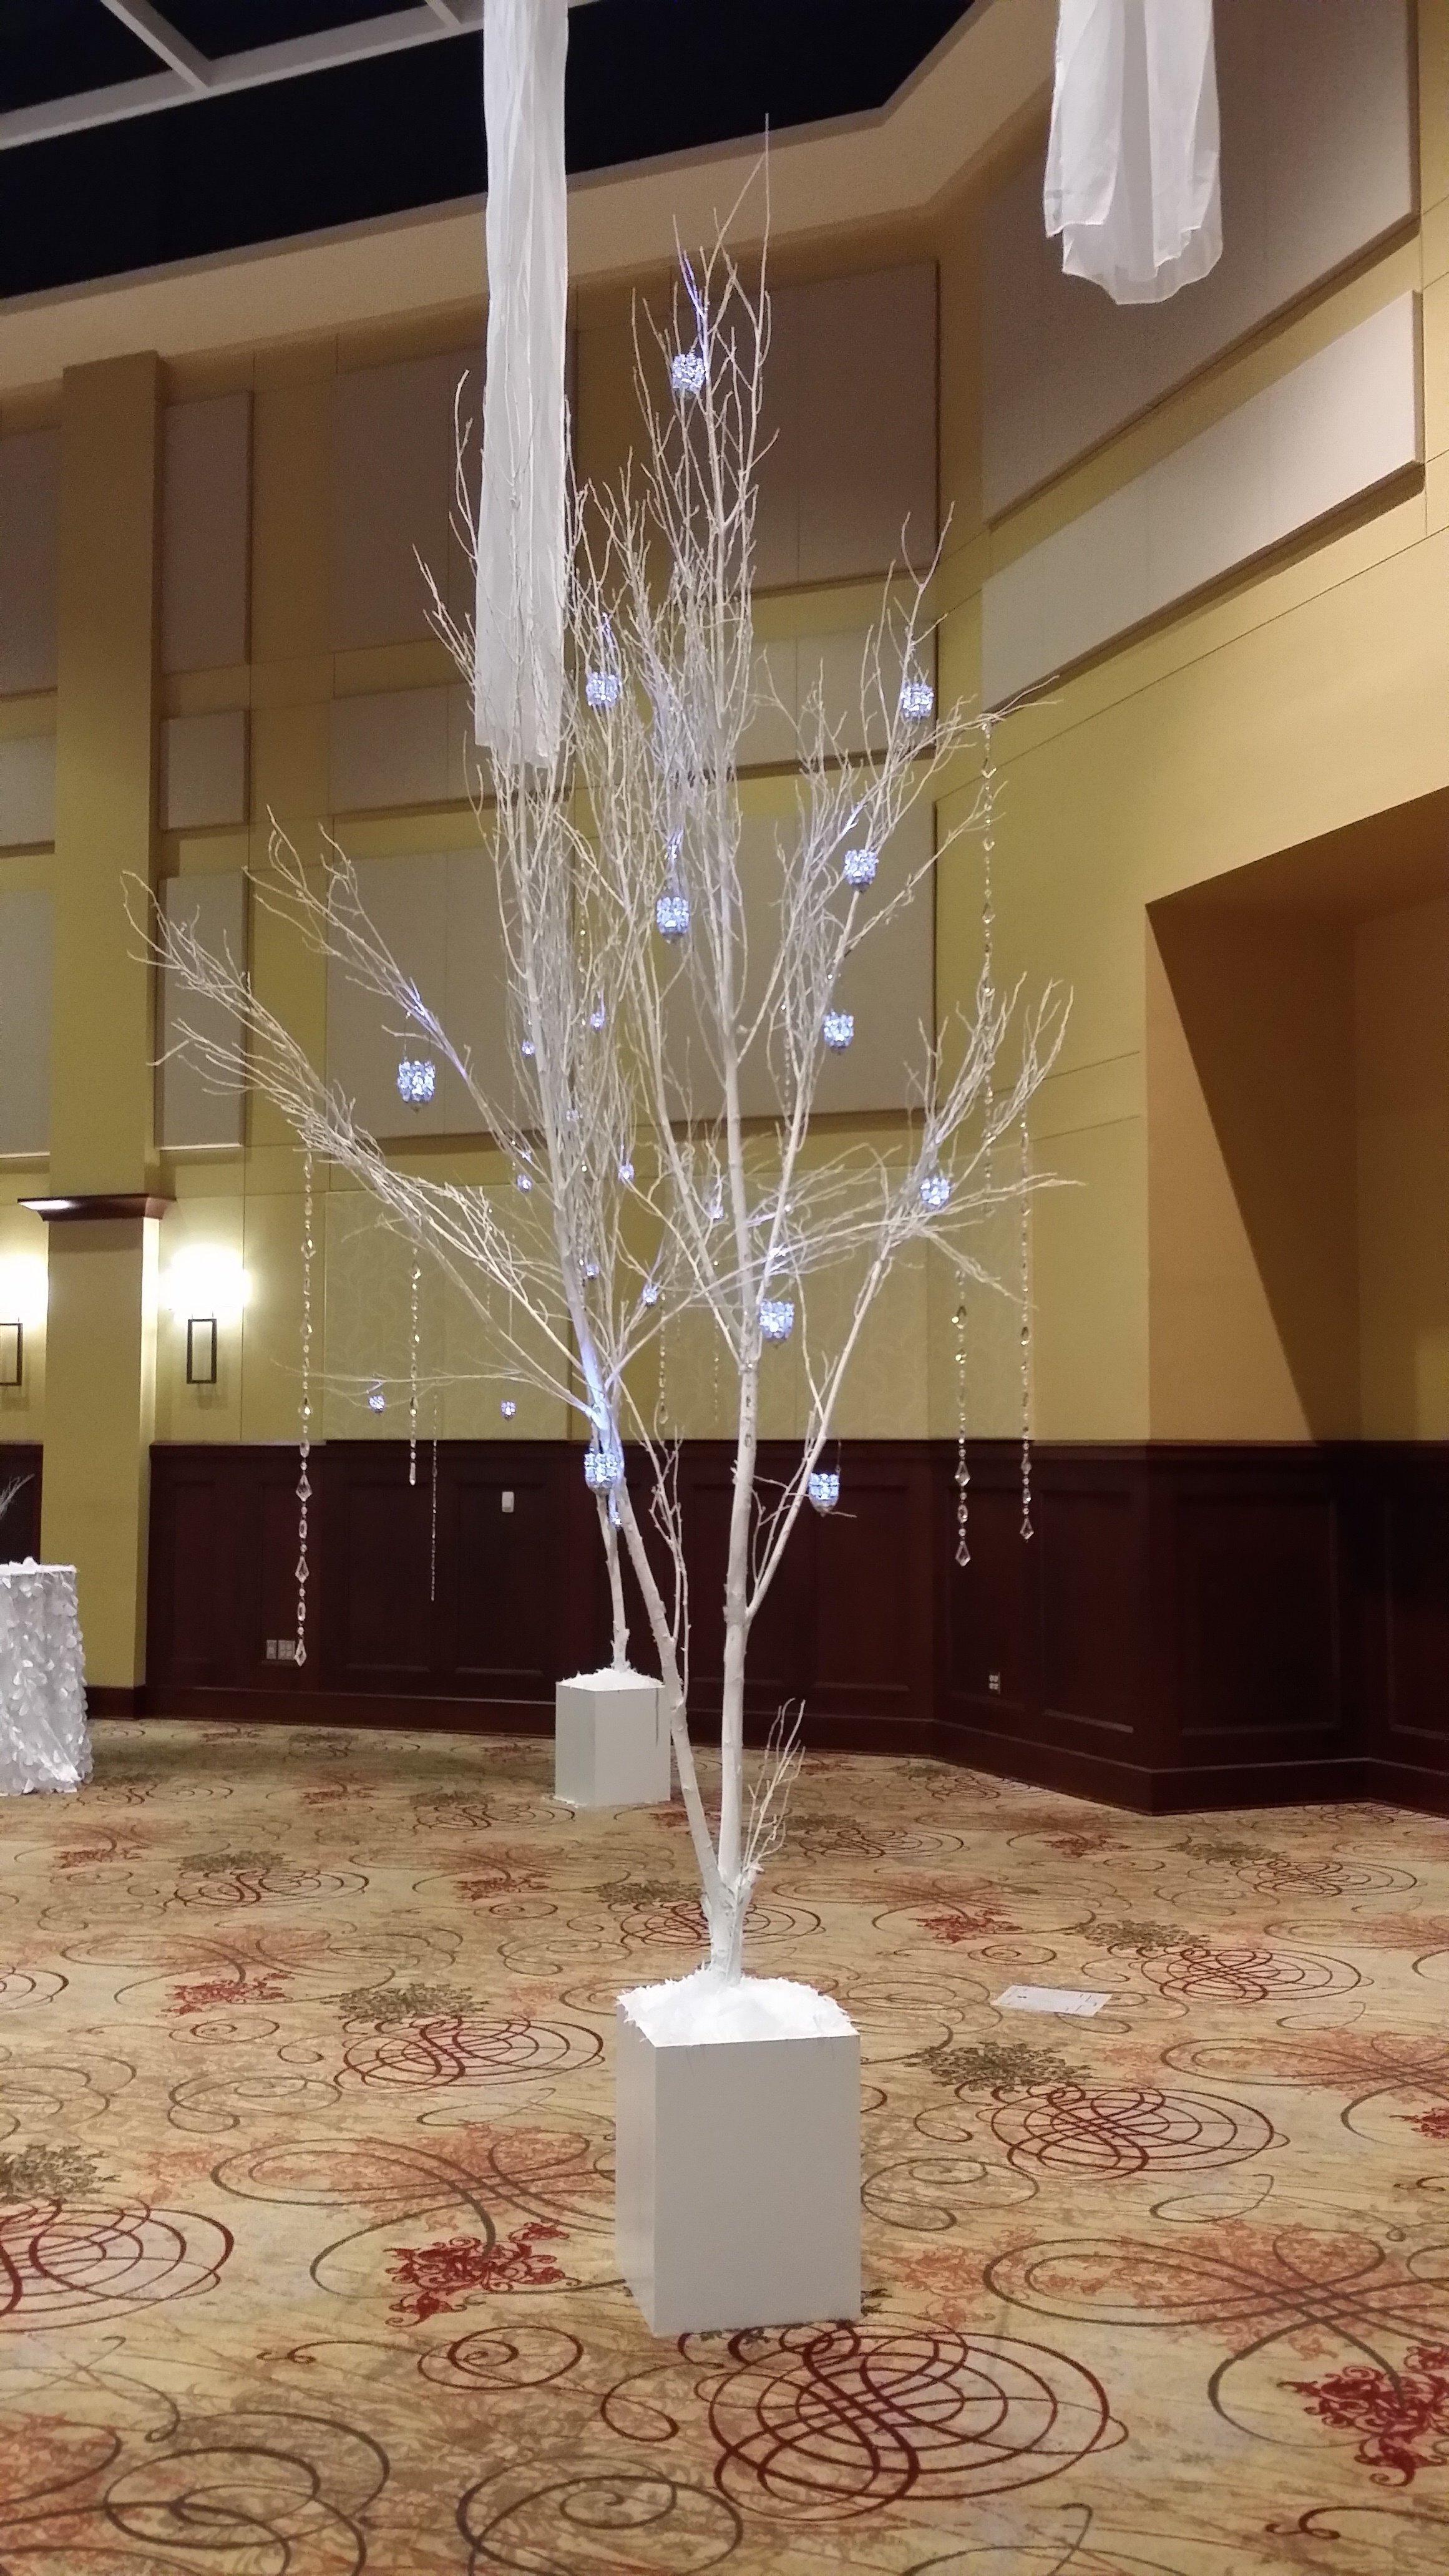 White Birch trunks